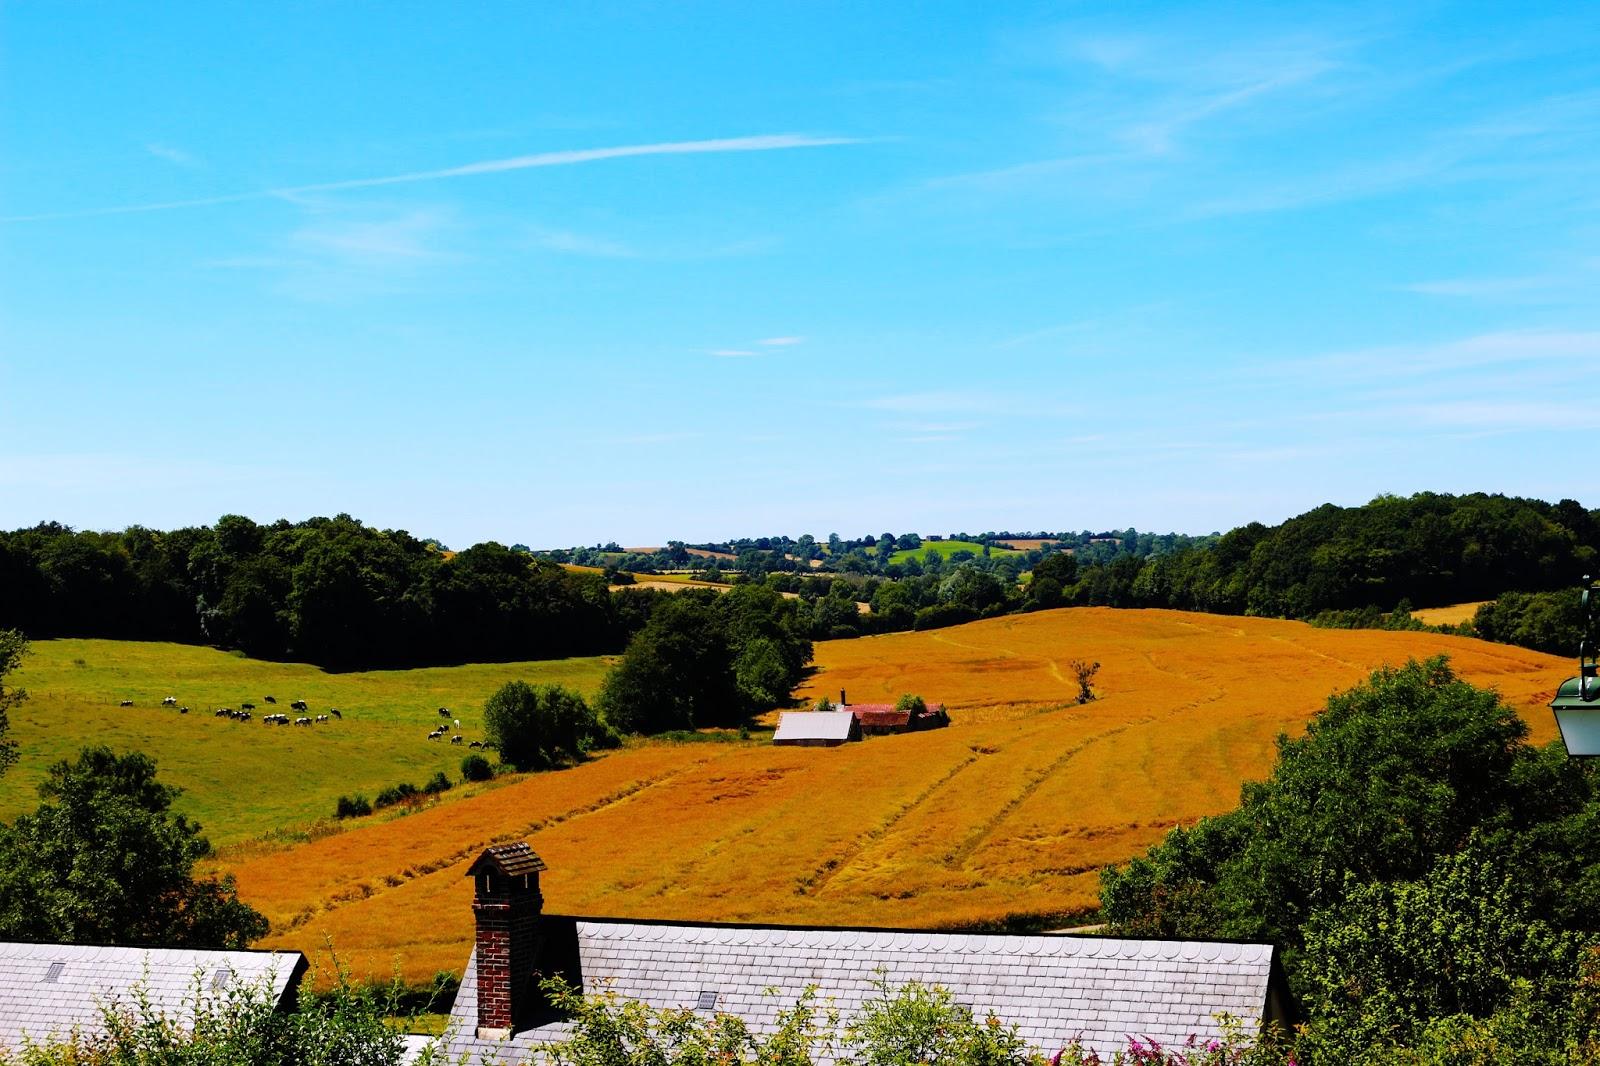 Countryside, Photography, Style, Landscape, France